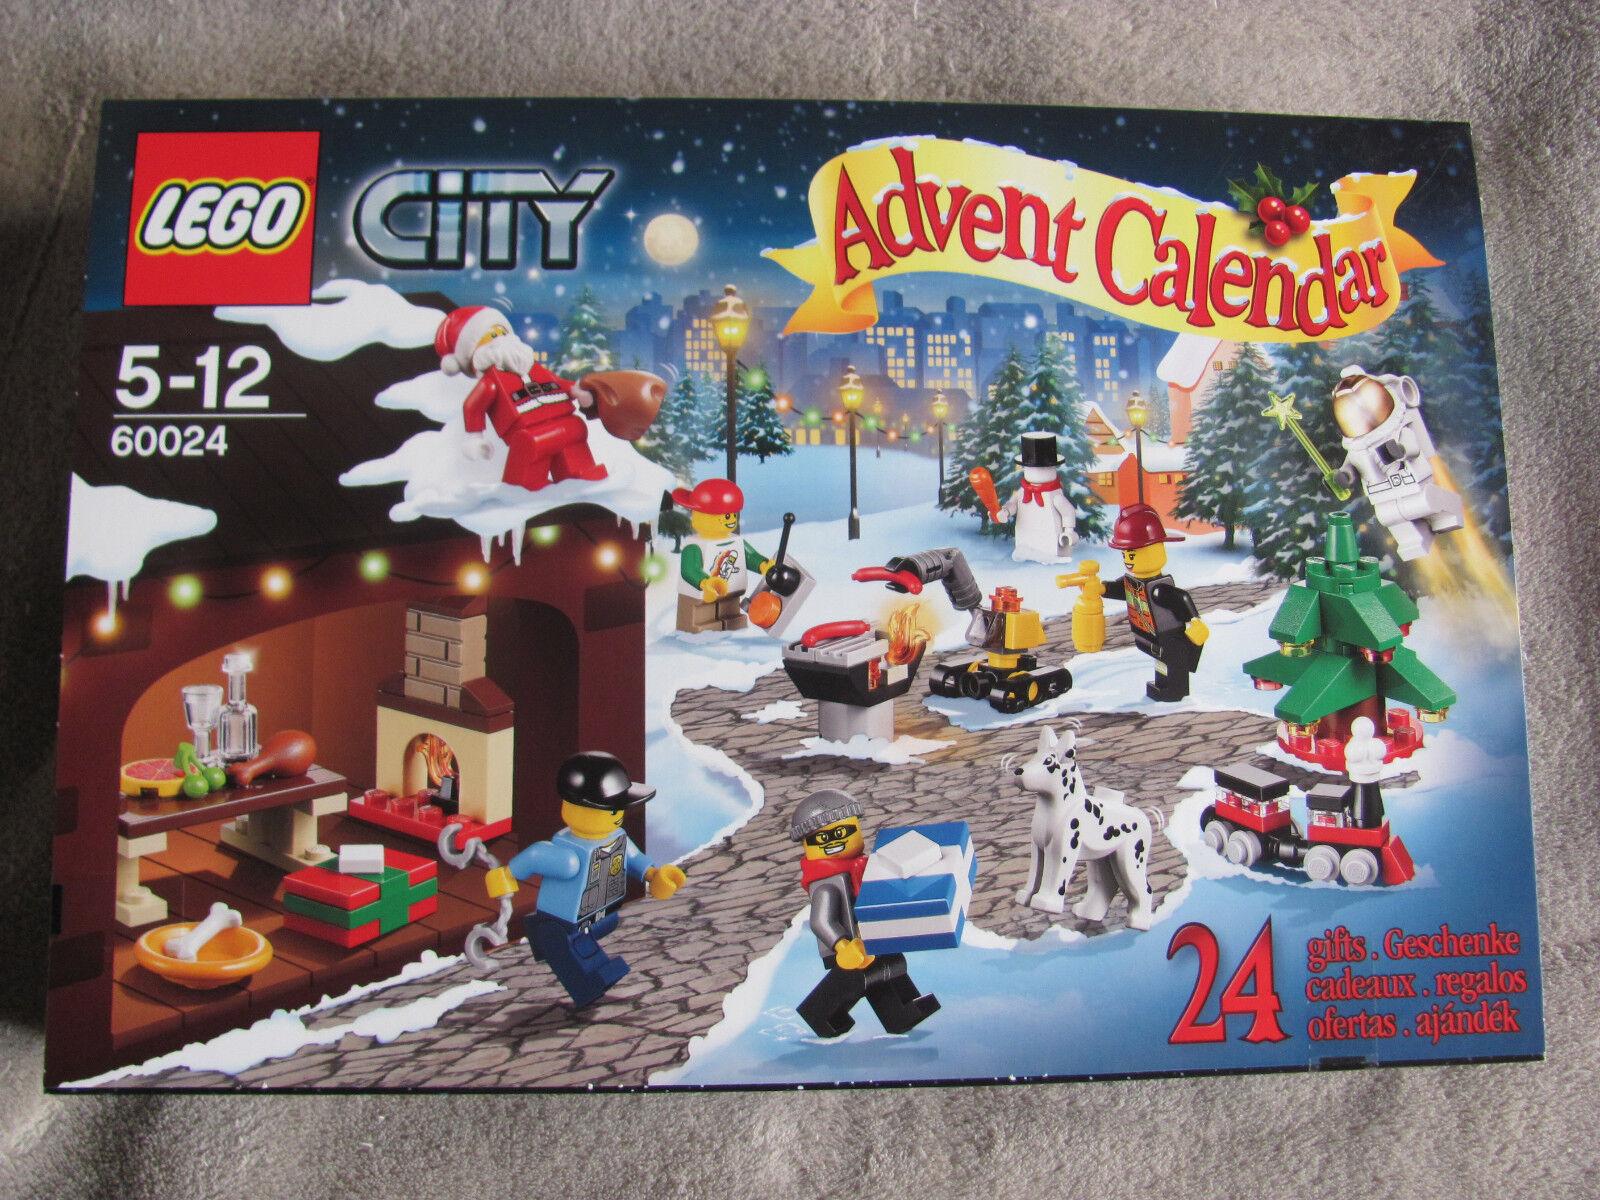 LEGO City Advent Calendario 60024 NUOVO & OVP Essen